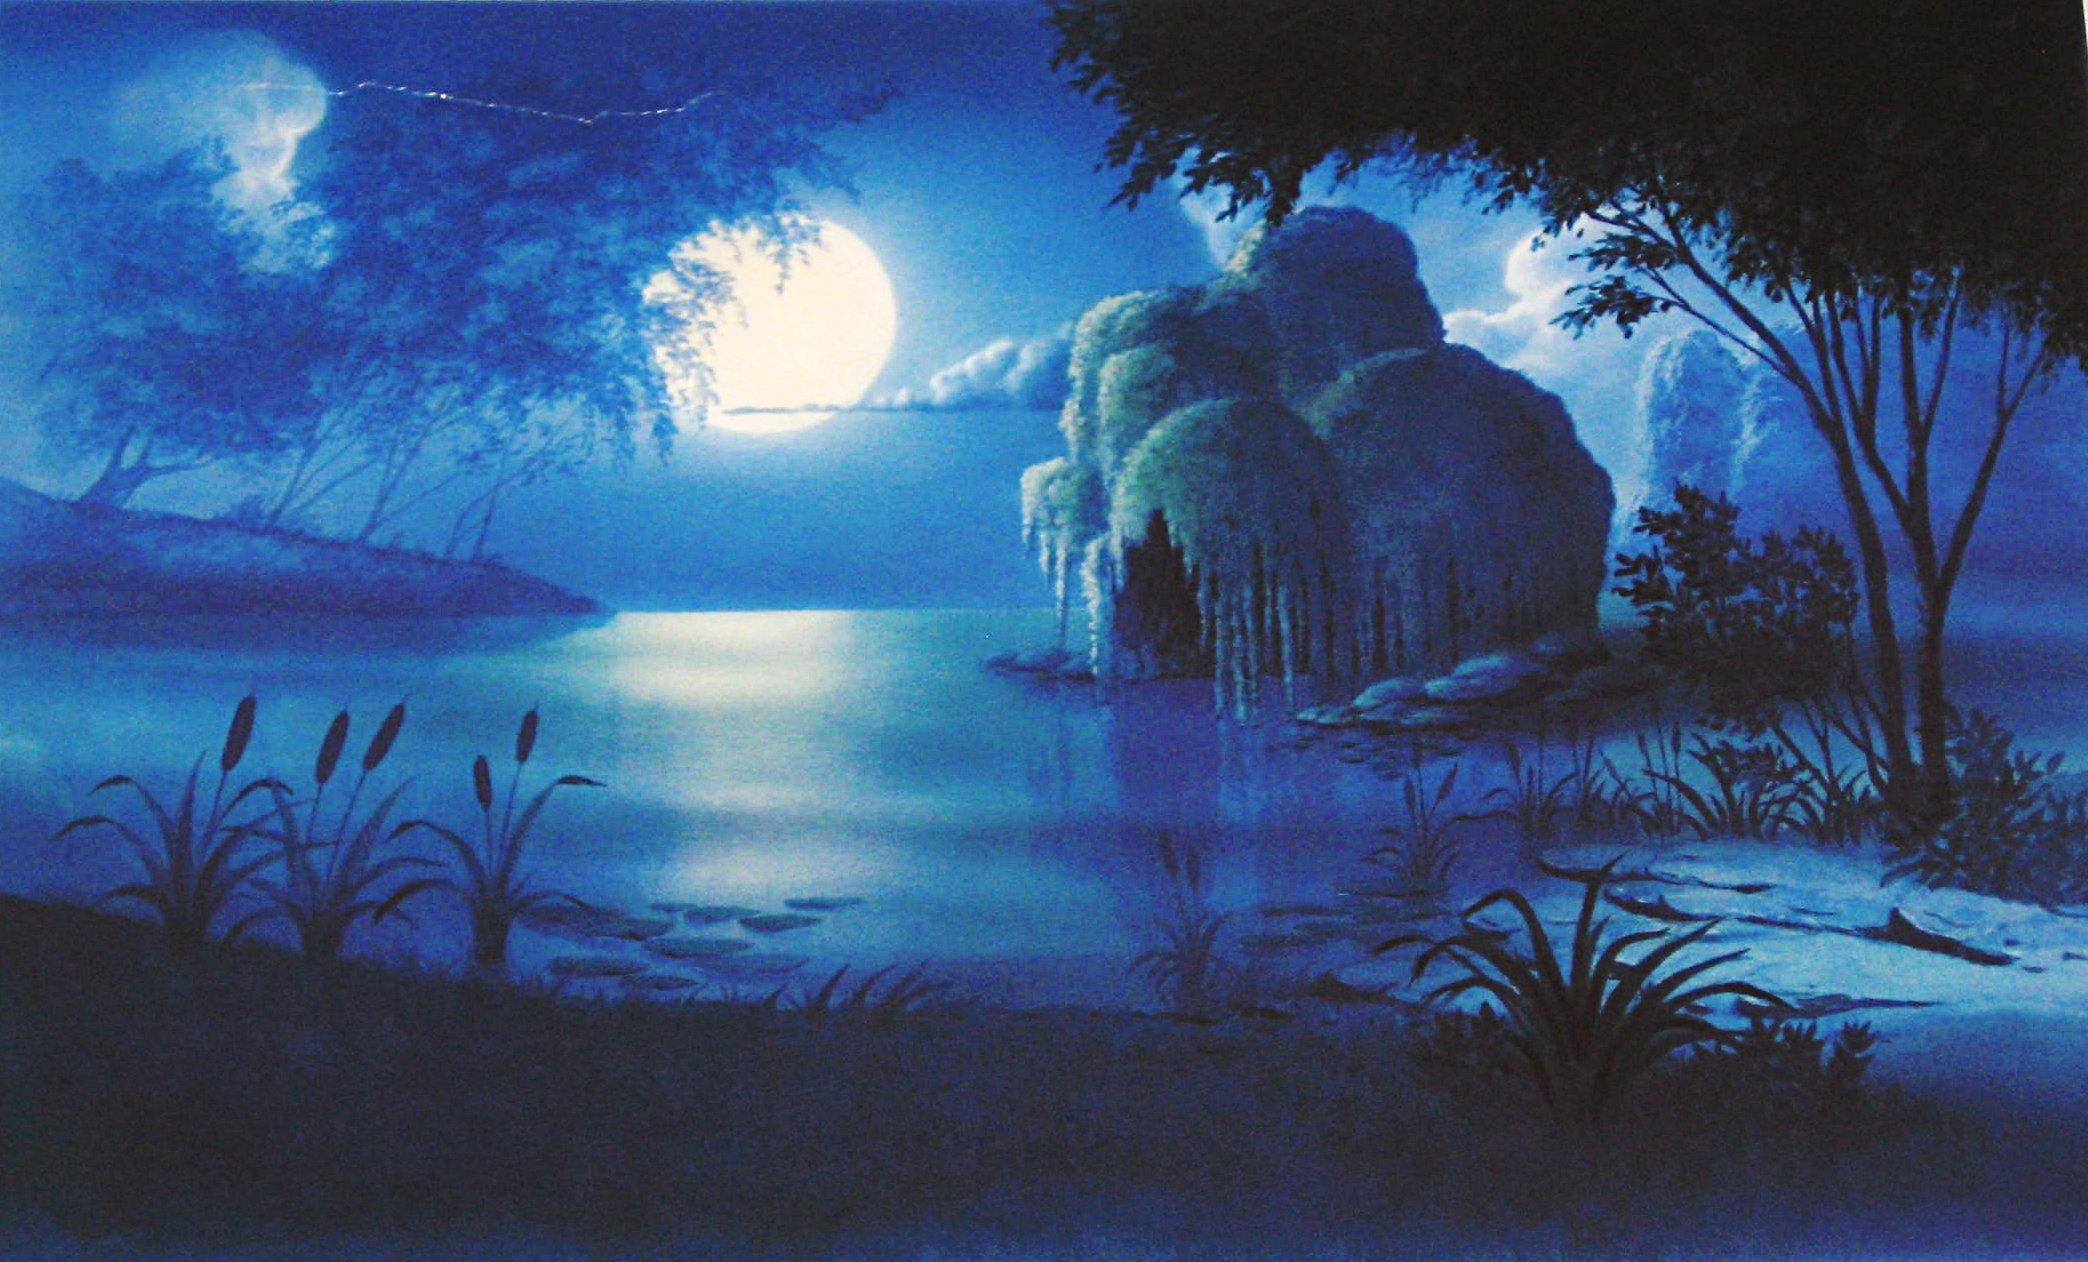 Disney Movies Hd Wallpapers: Disney Descendants Wallpaper